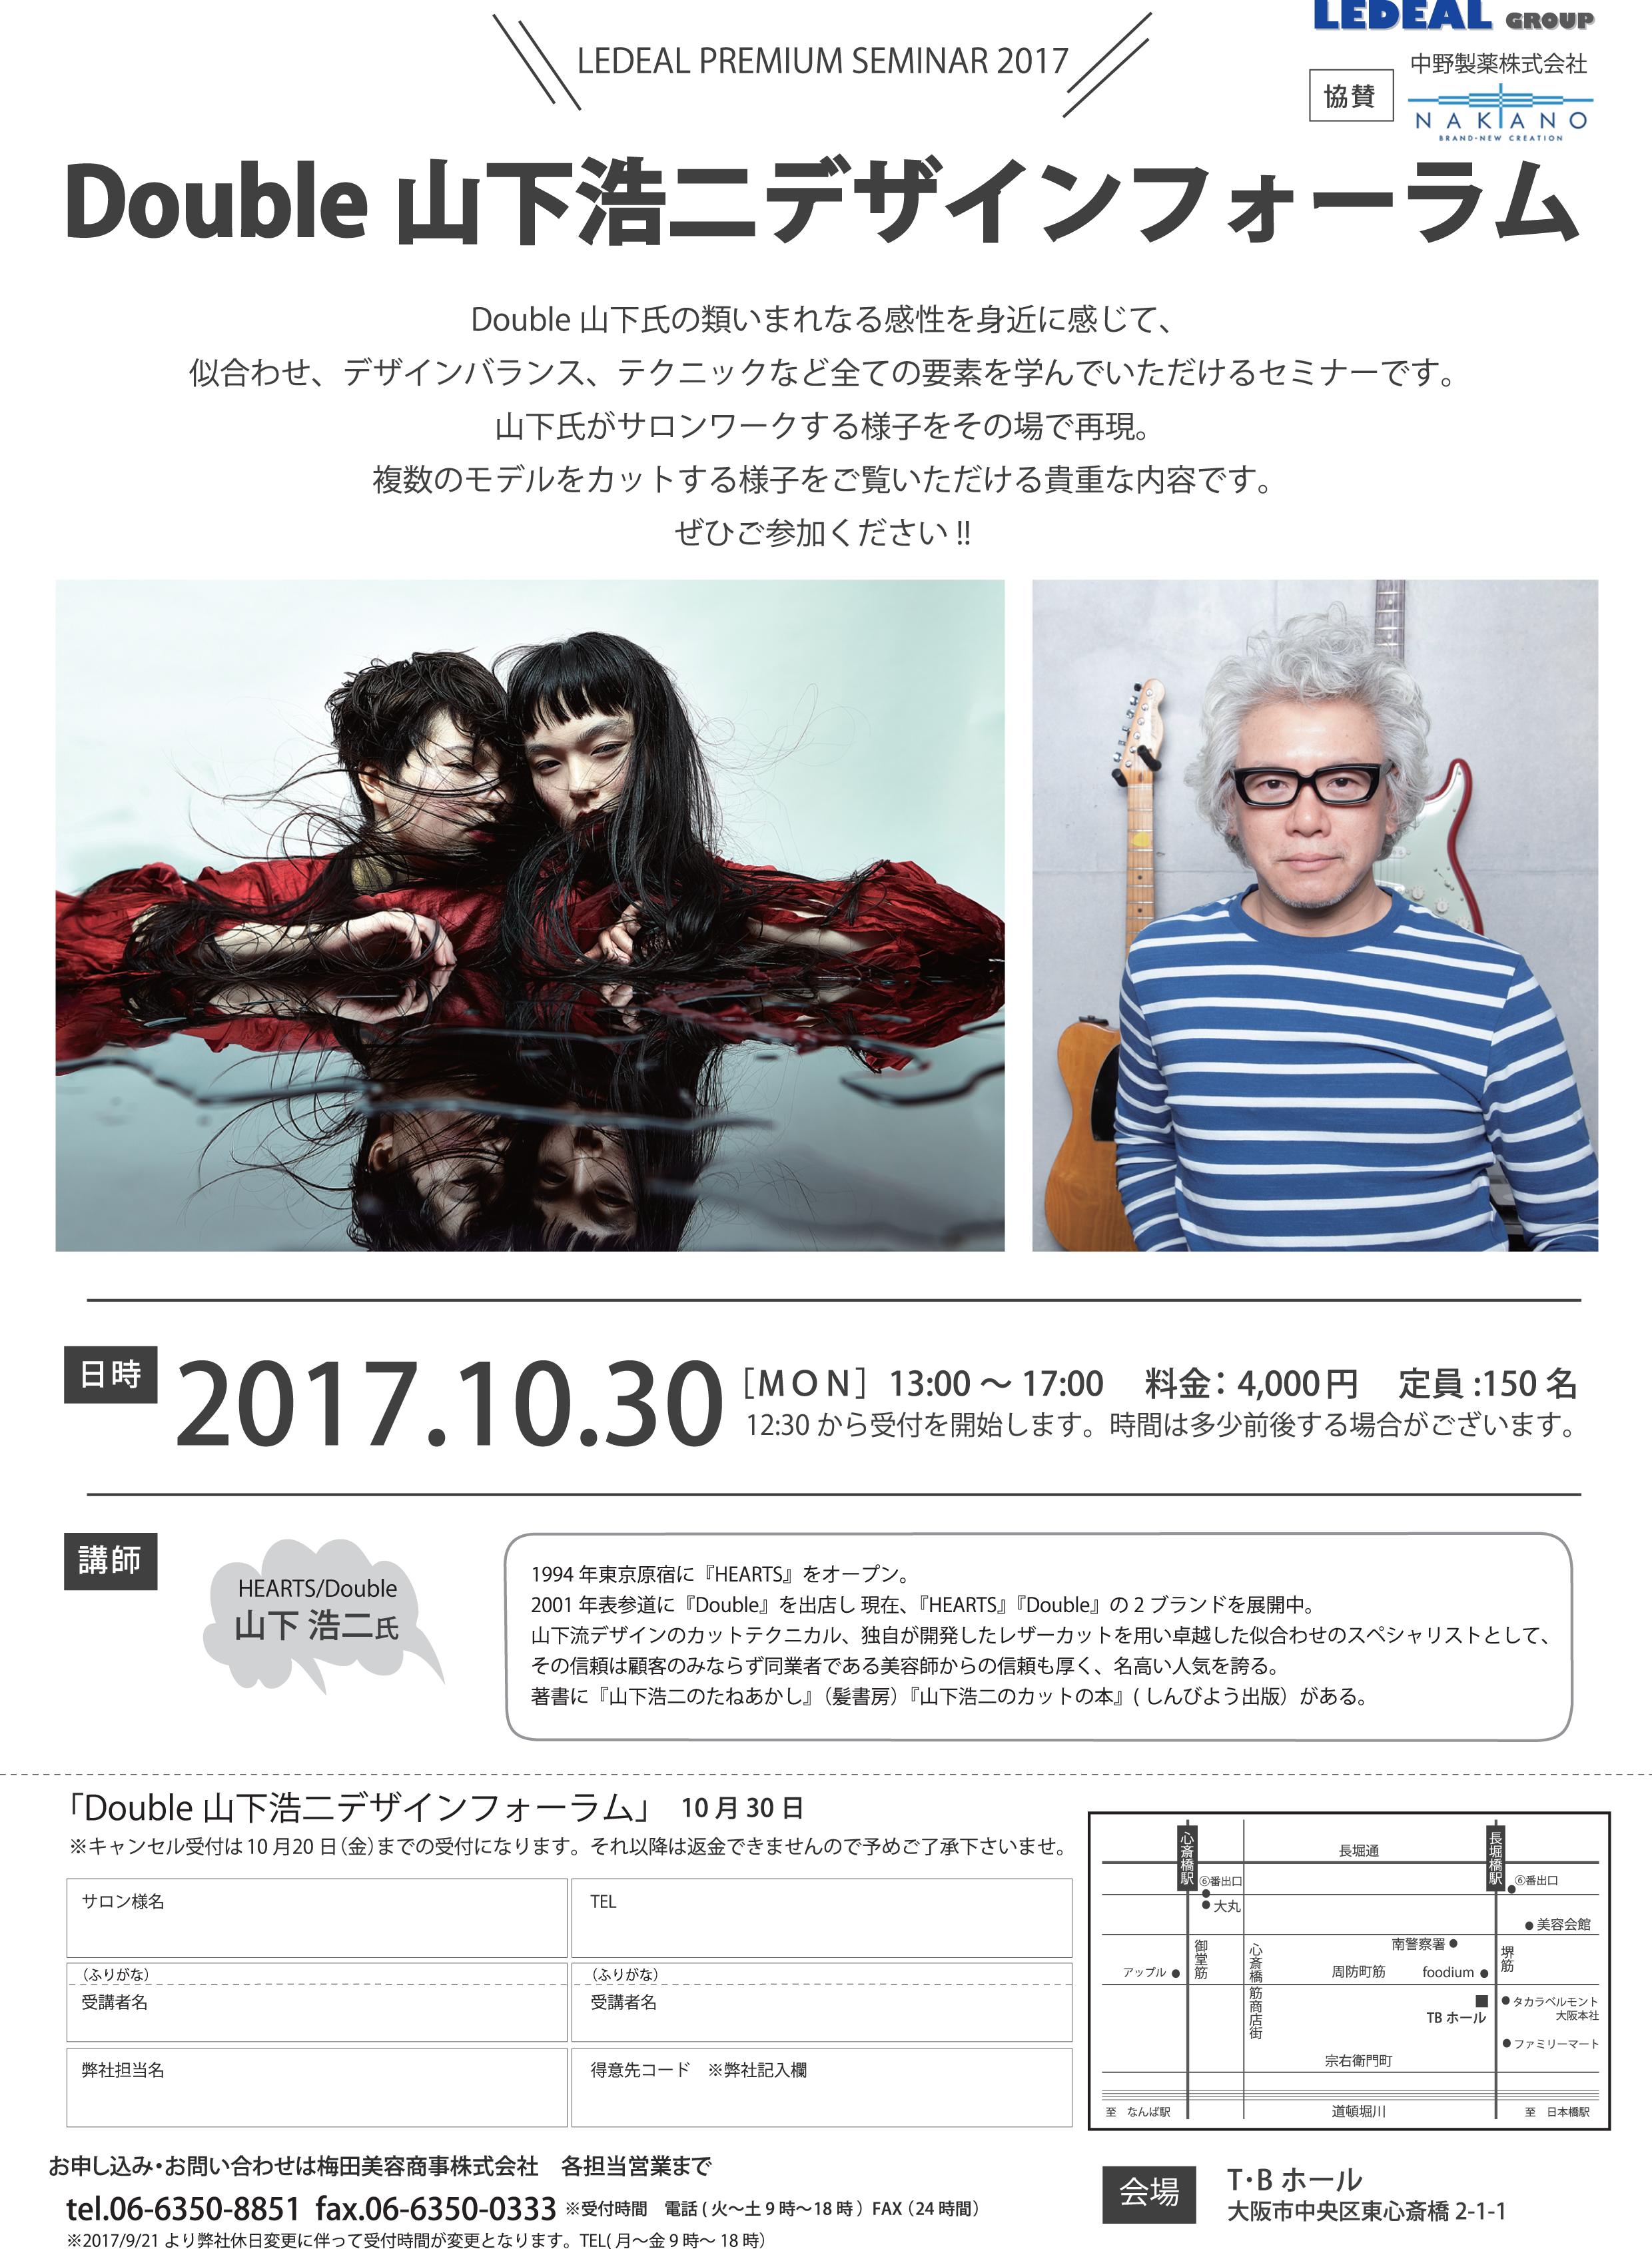 Double山下氏デザインフォーラムセミナー